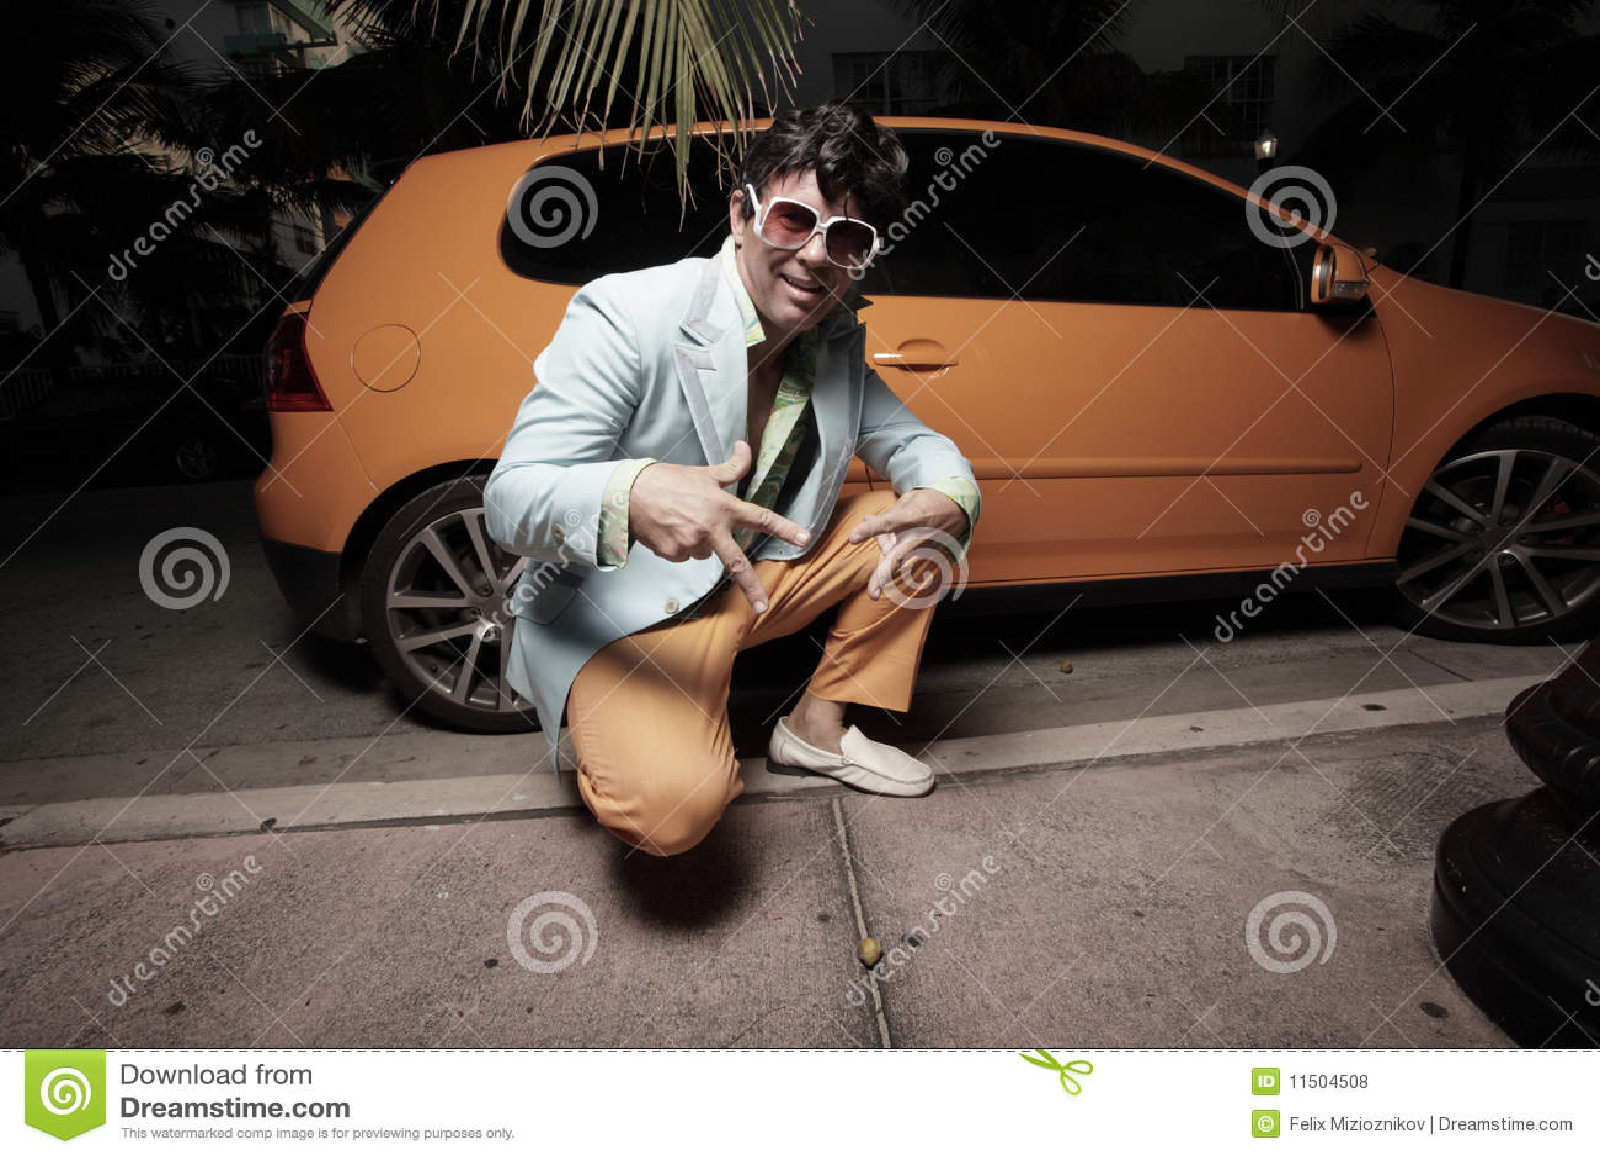 man posing by an orange sports car royalty free stock